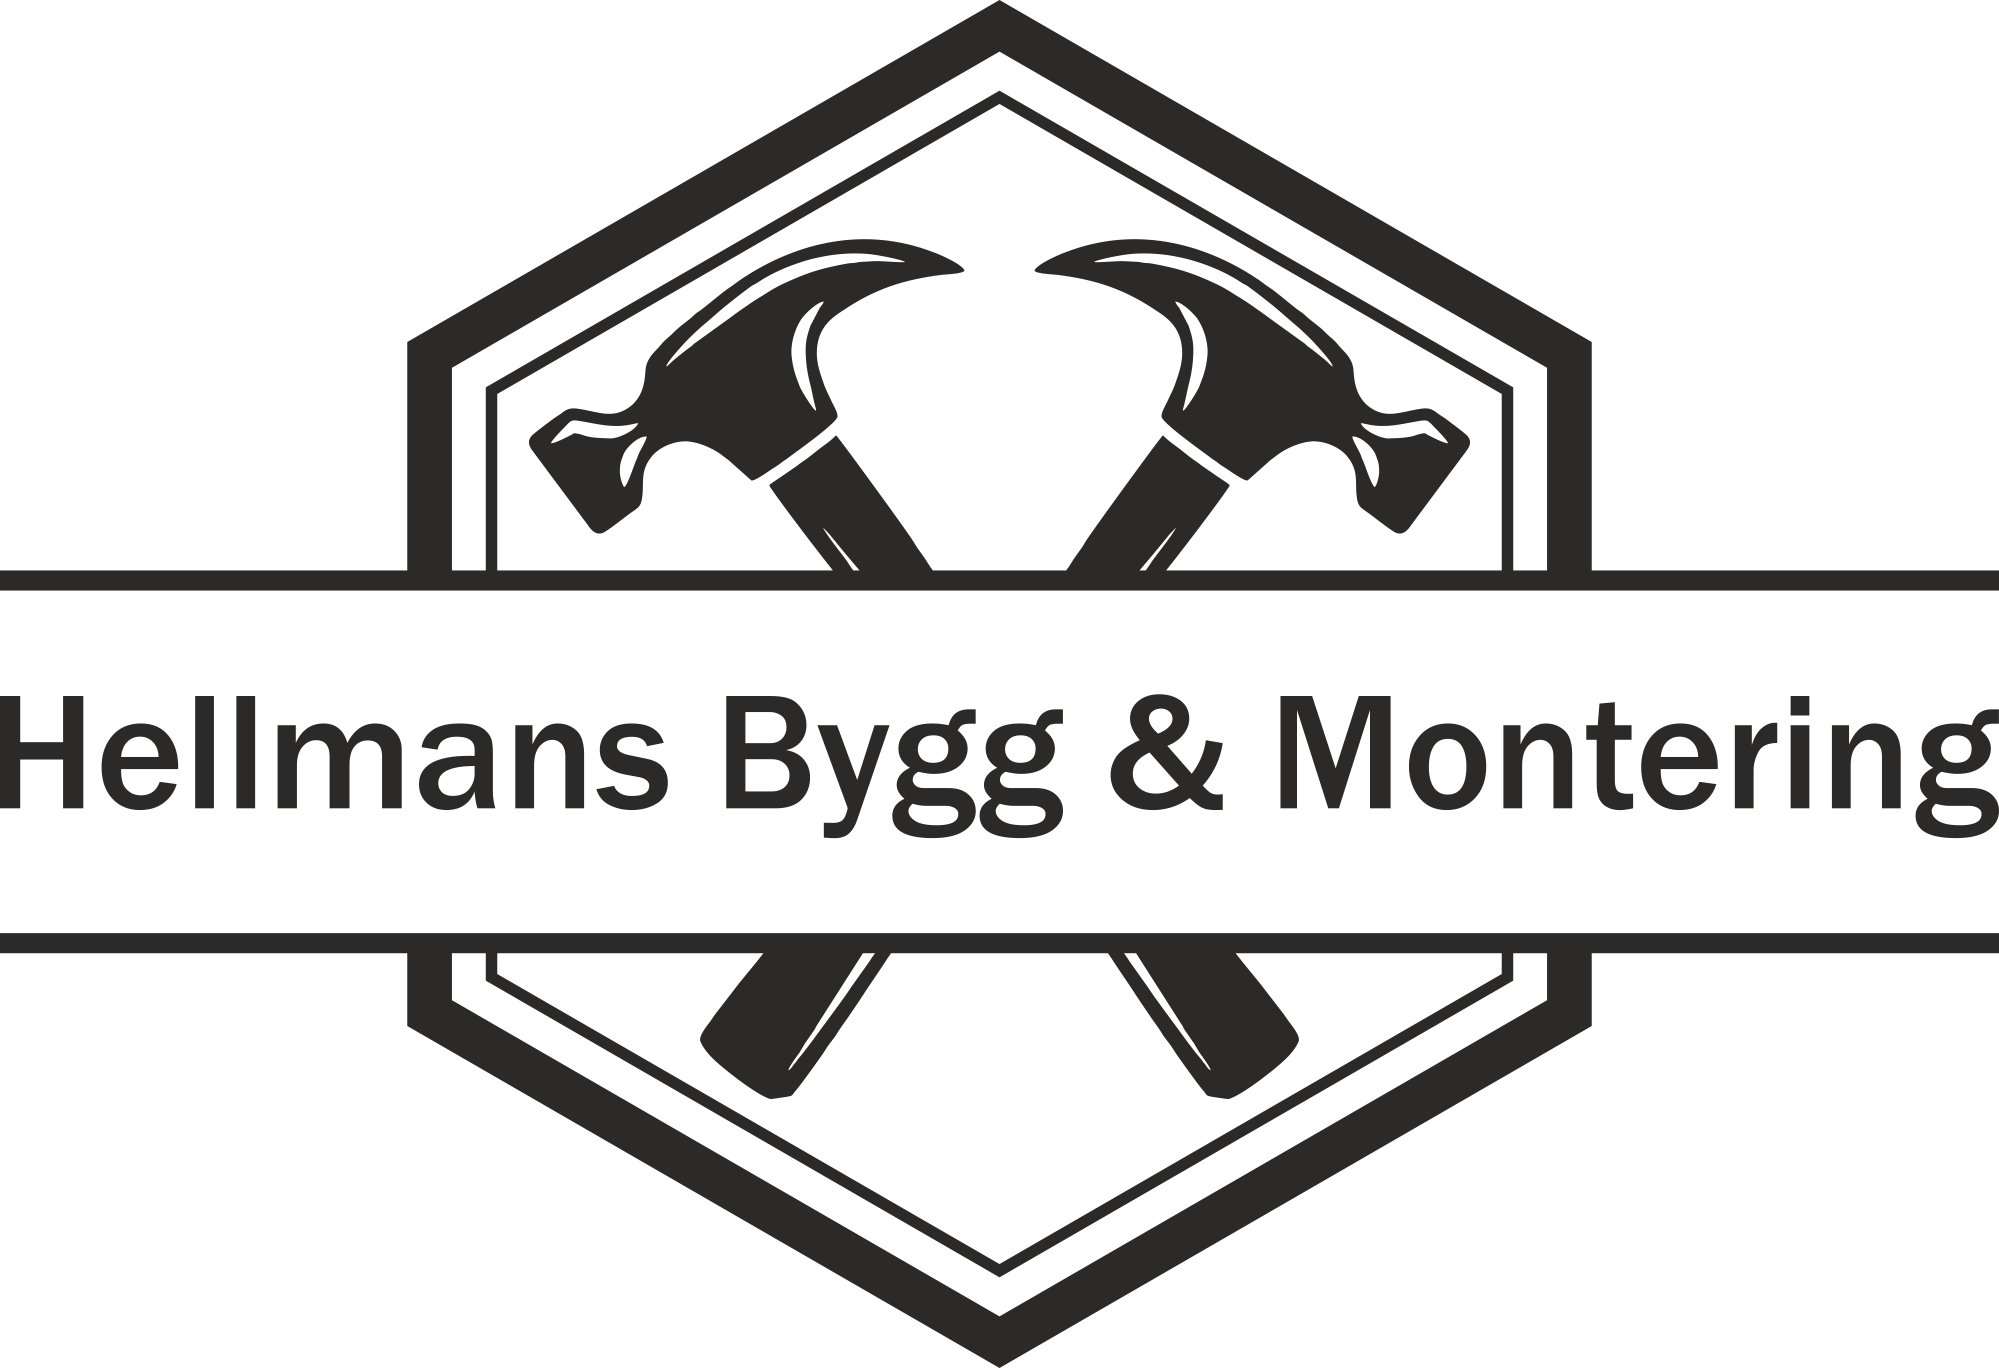 Hellmans Bygg & Montering